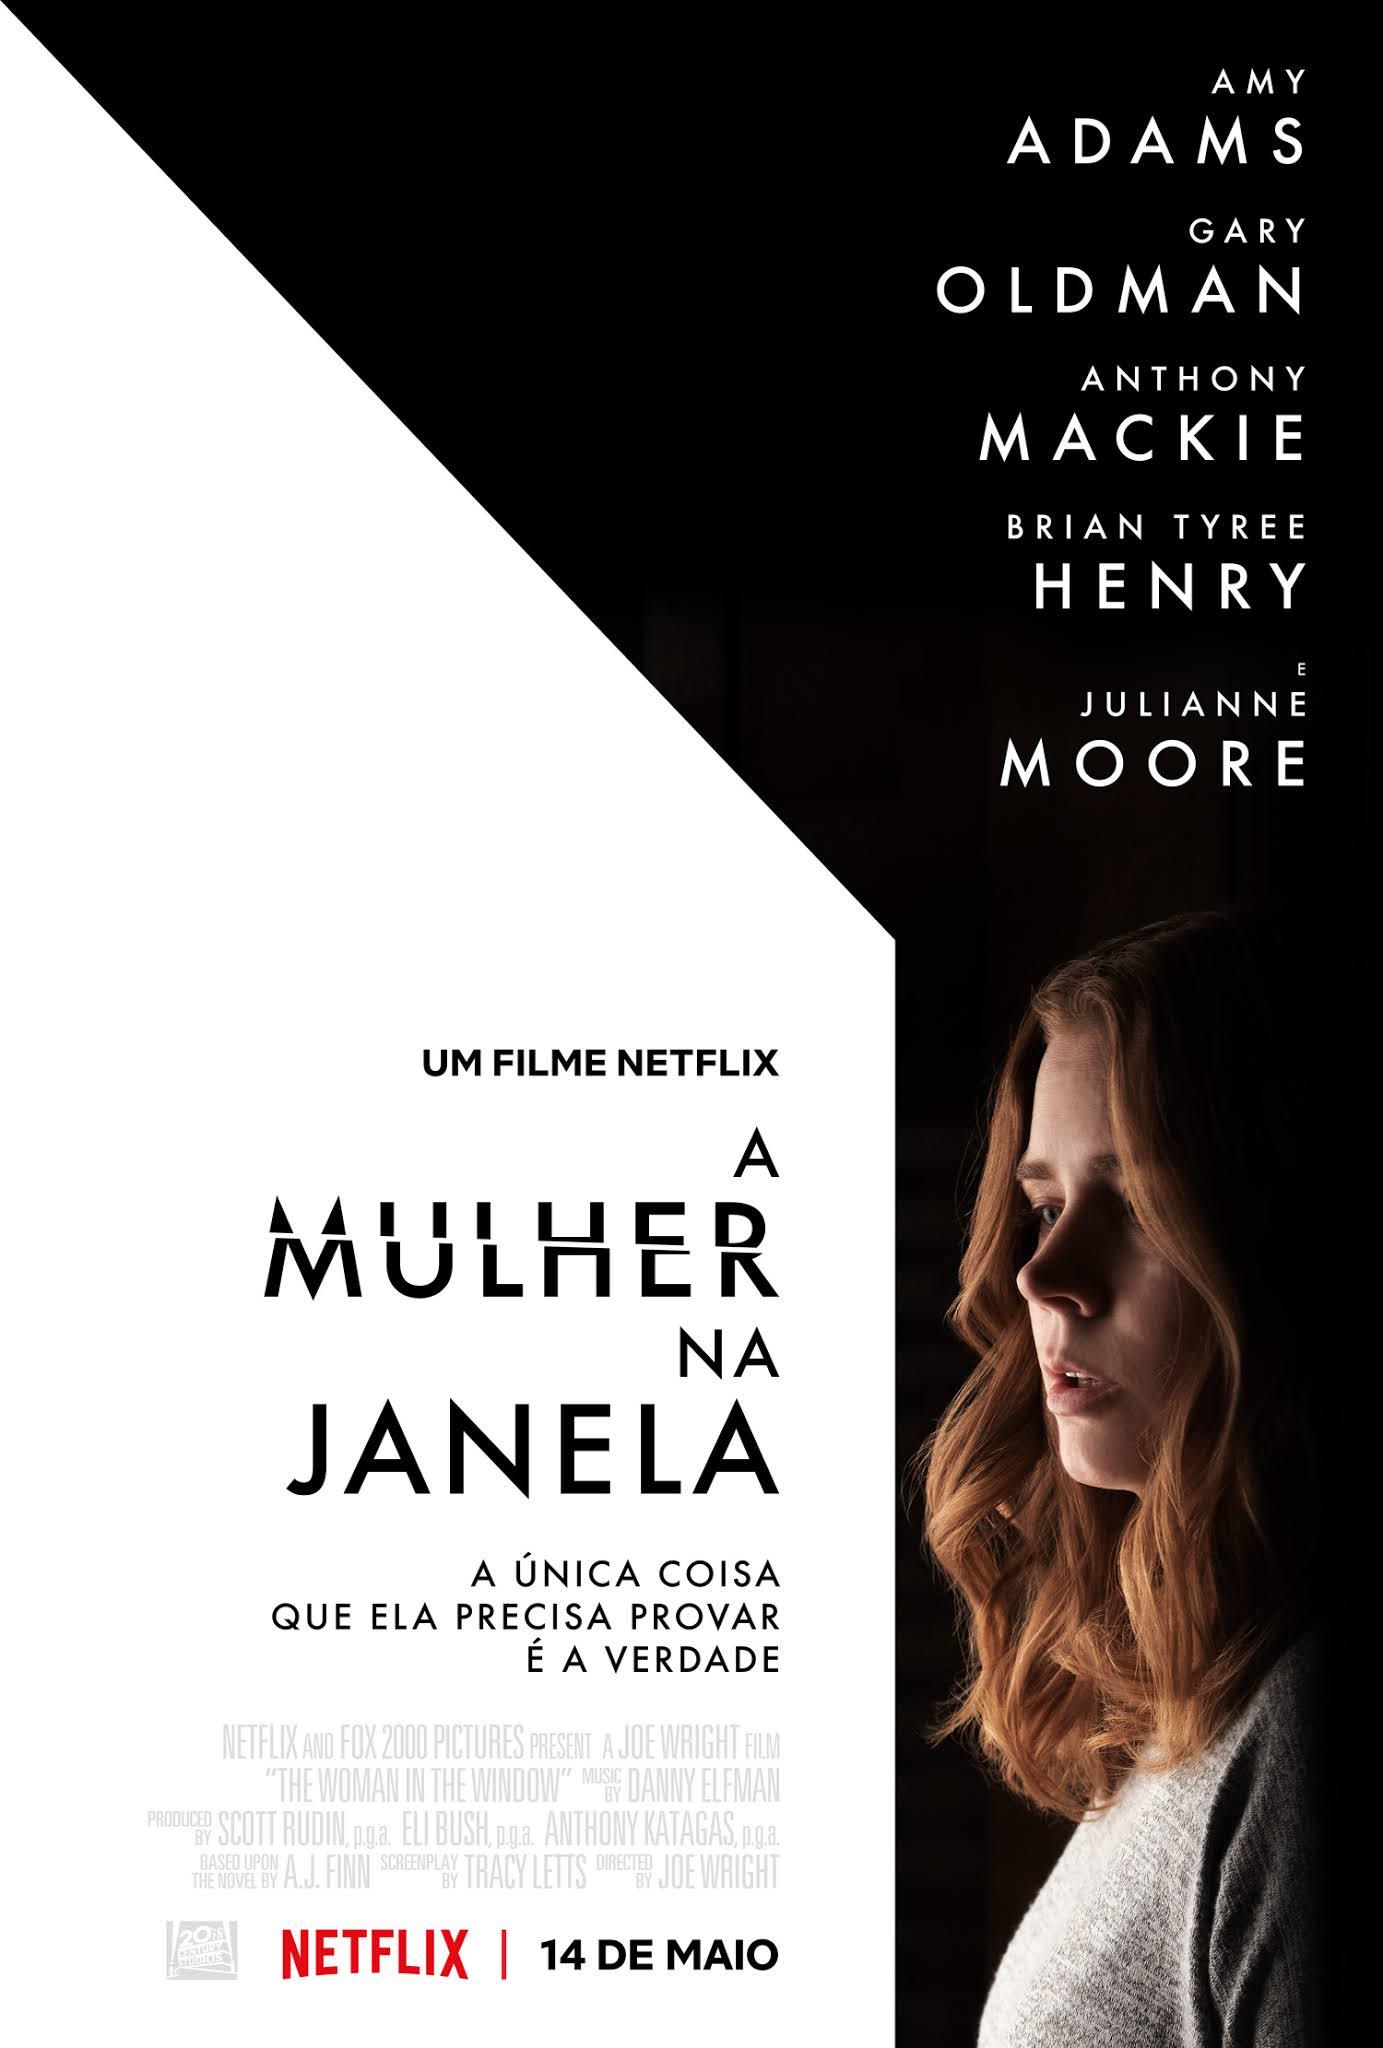 Assista à Amy Adams no trailer de 'A Mulher na Janela'